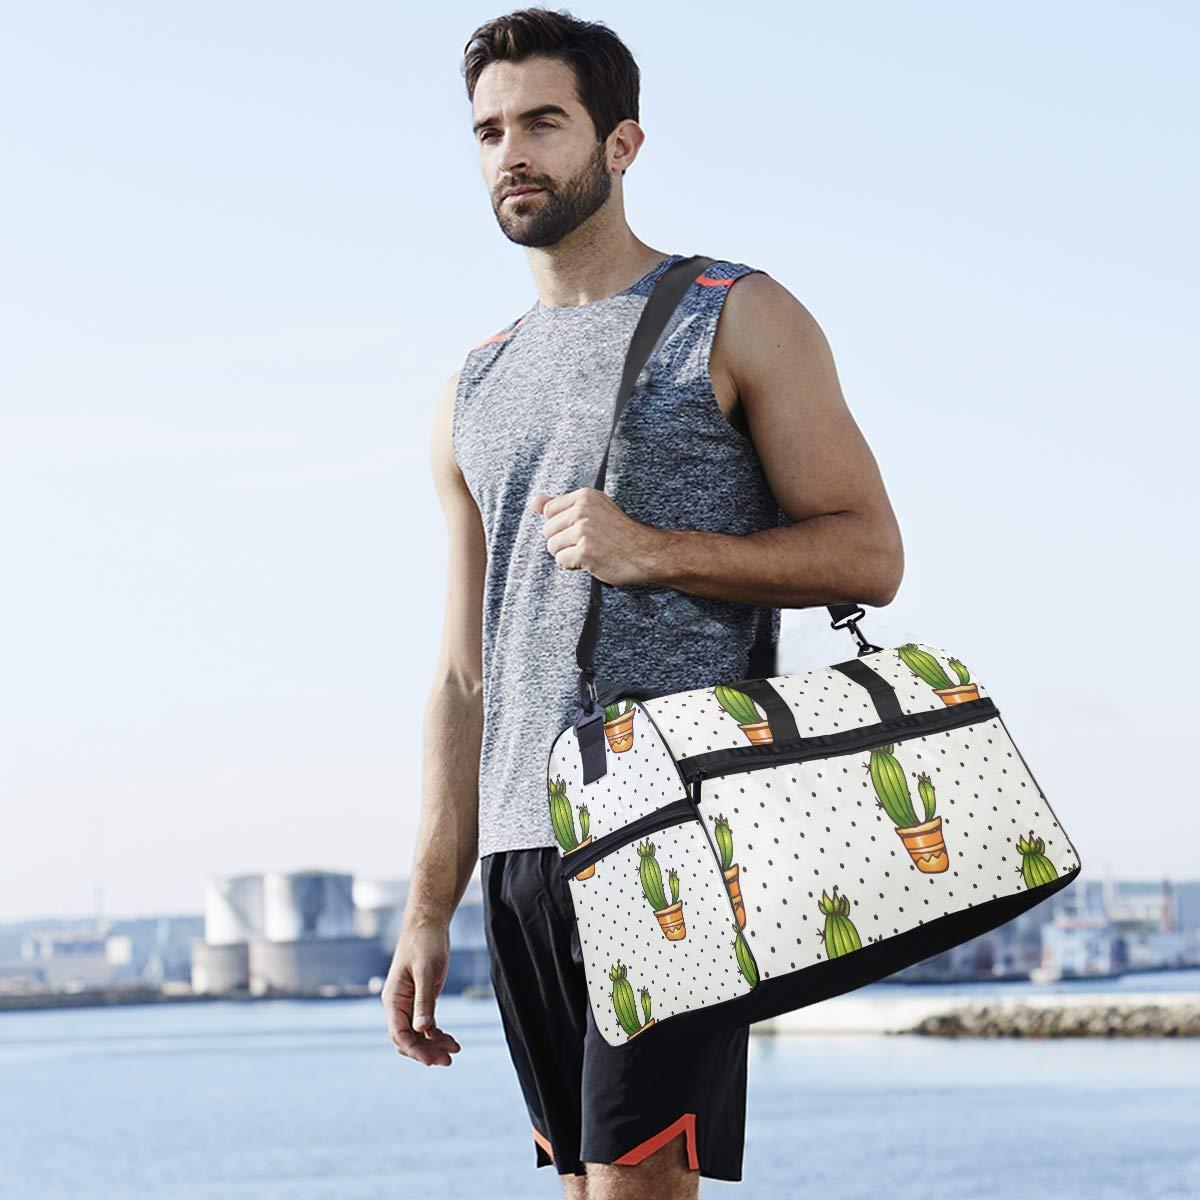 Dot Black Cactus Planter Large Travel Duffel Bag For Women Men Overnight Weekend Lightweight Luggage Bag